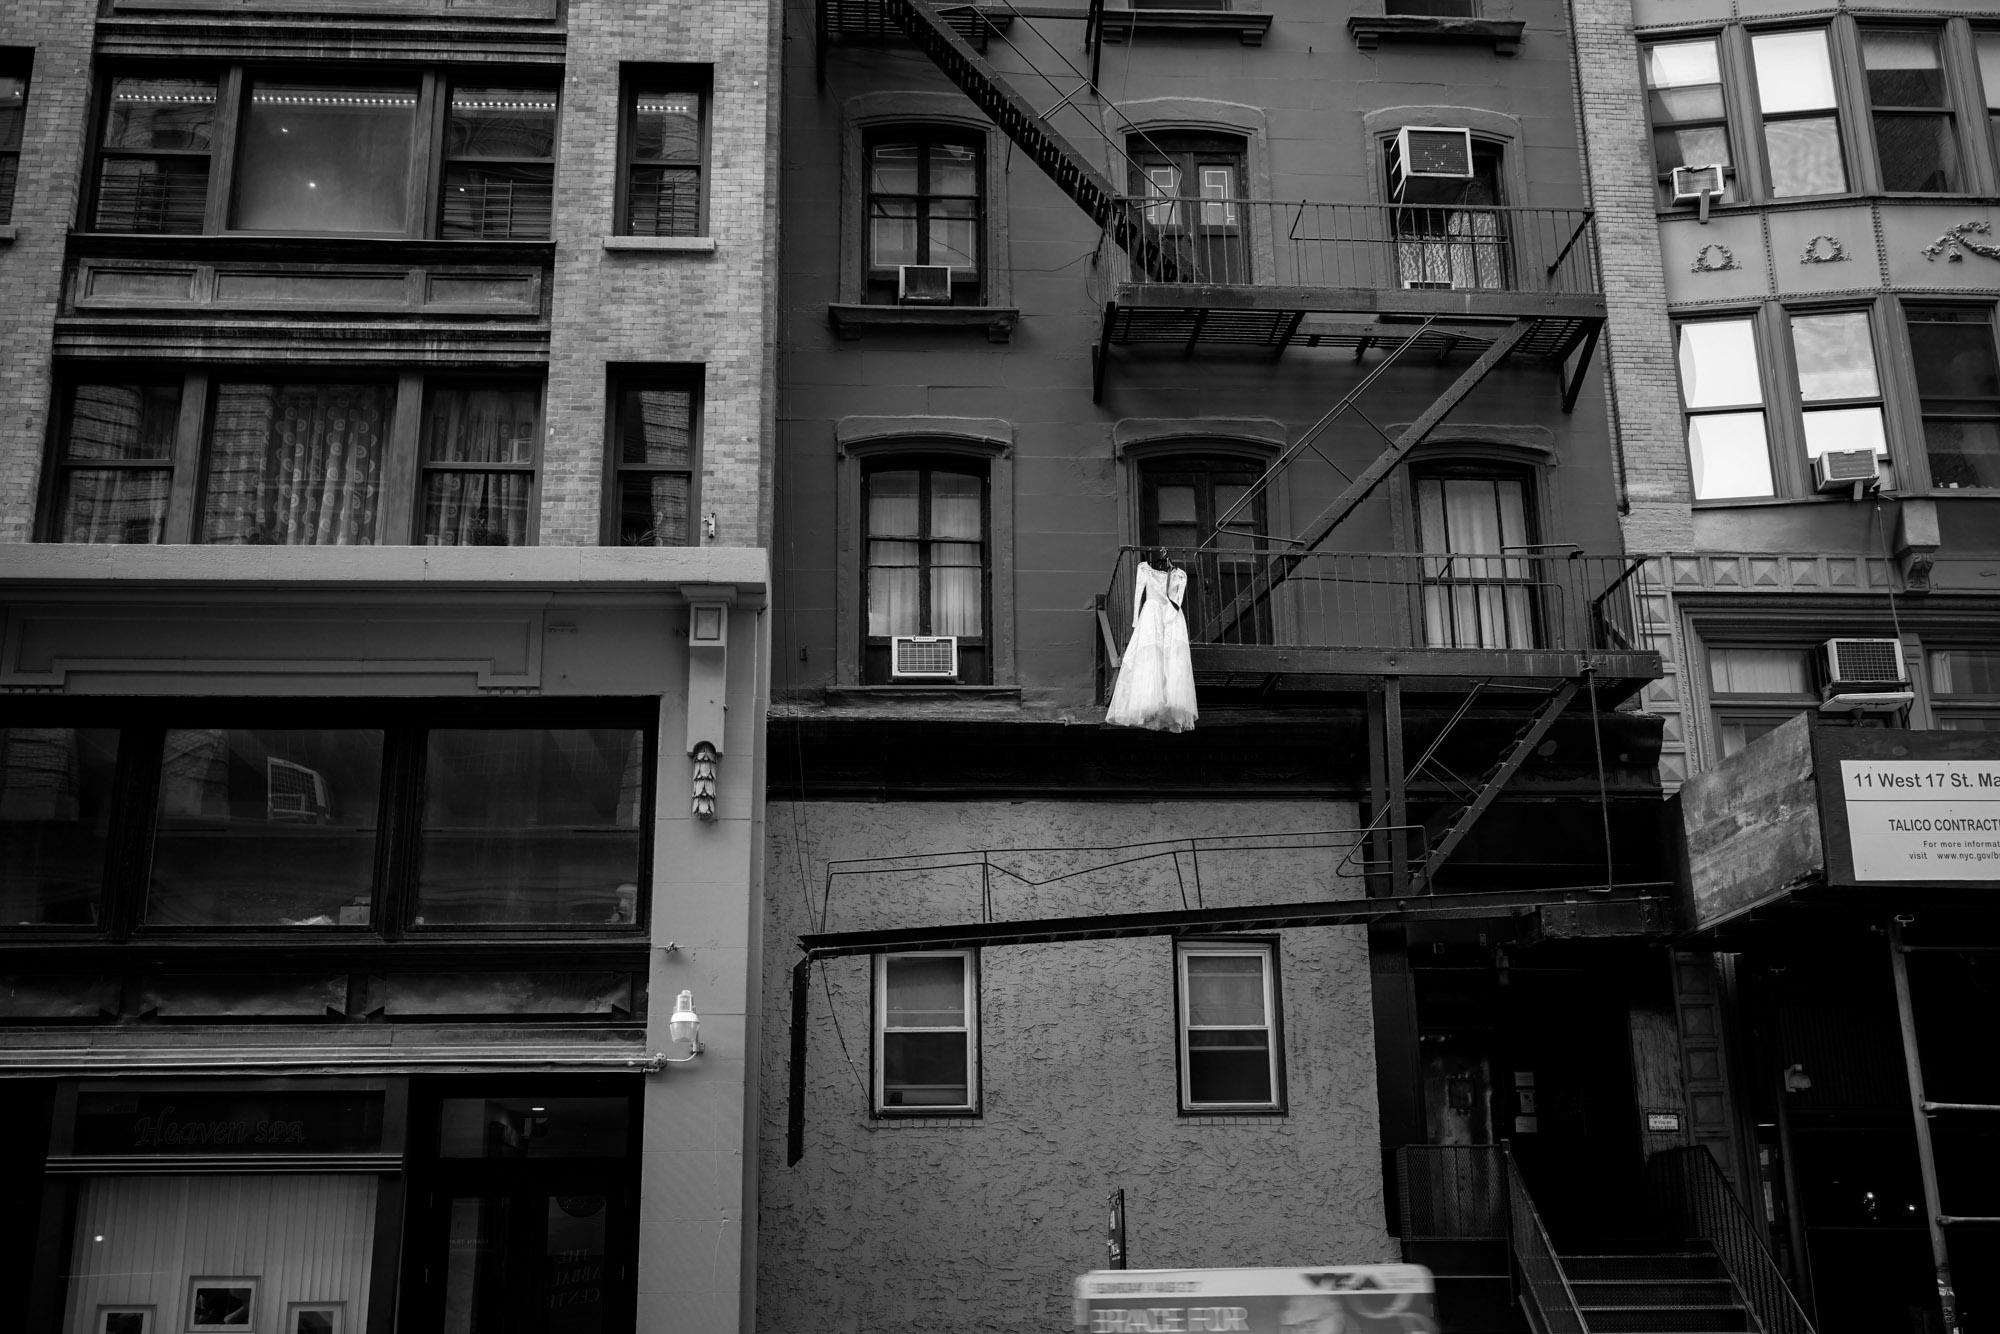 new_york_citay-04871.jpg